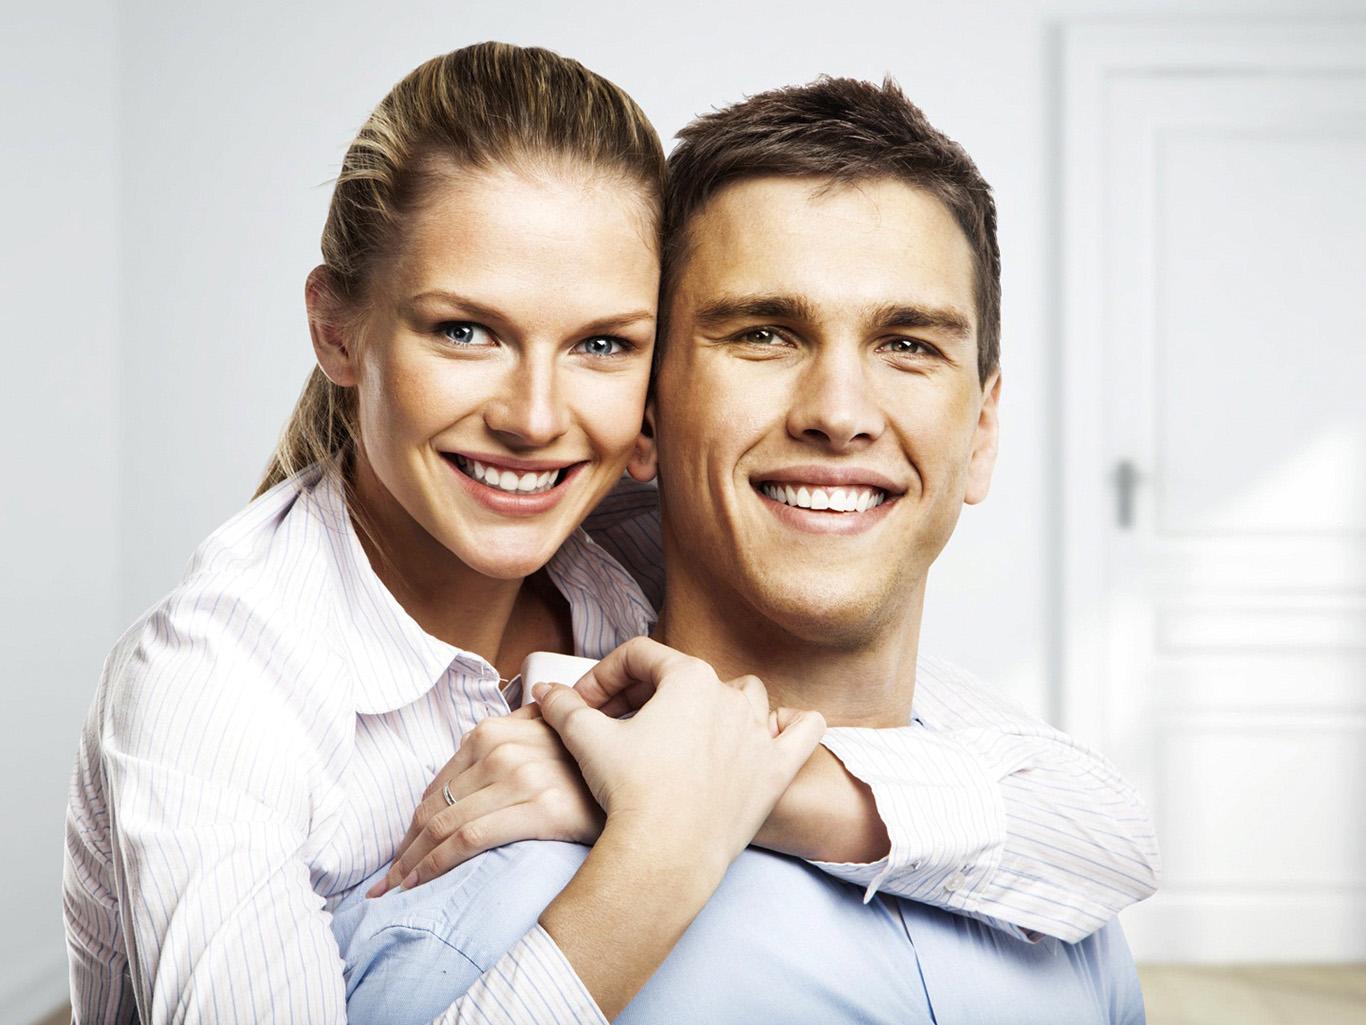 Разговоры с женой о сексе